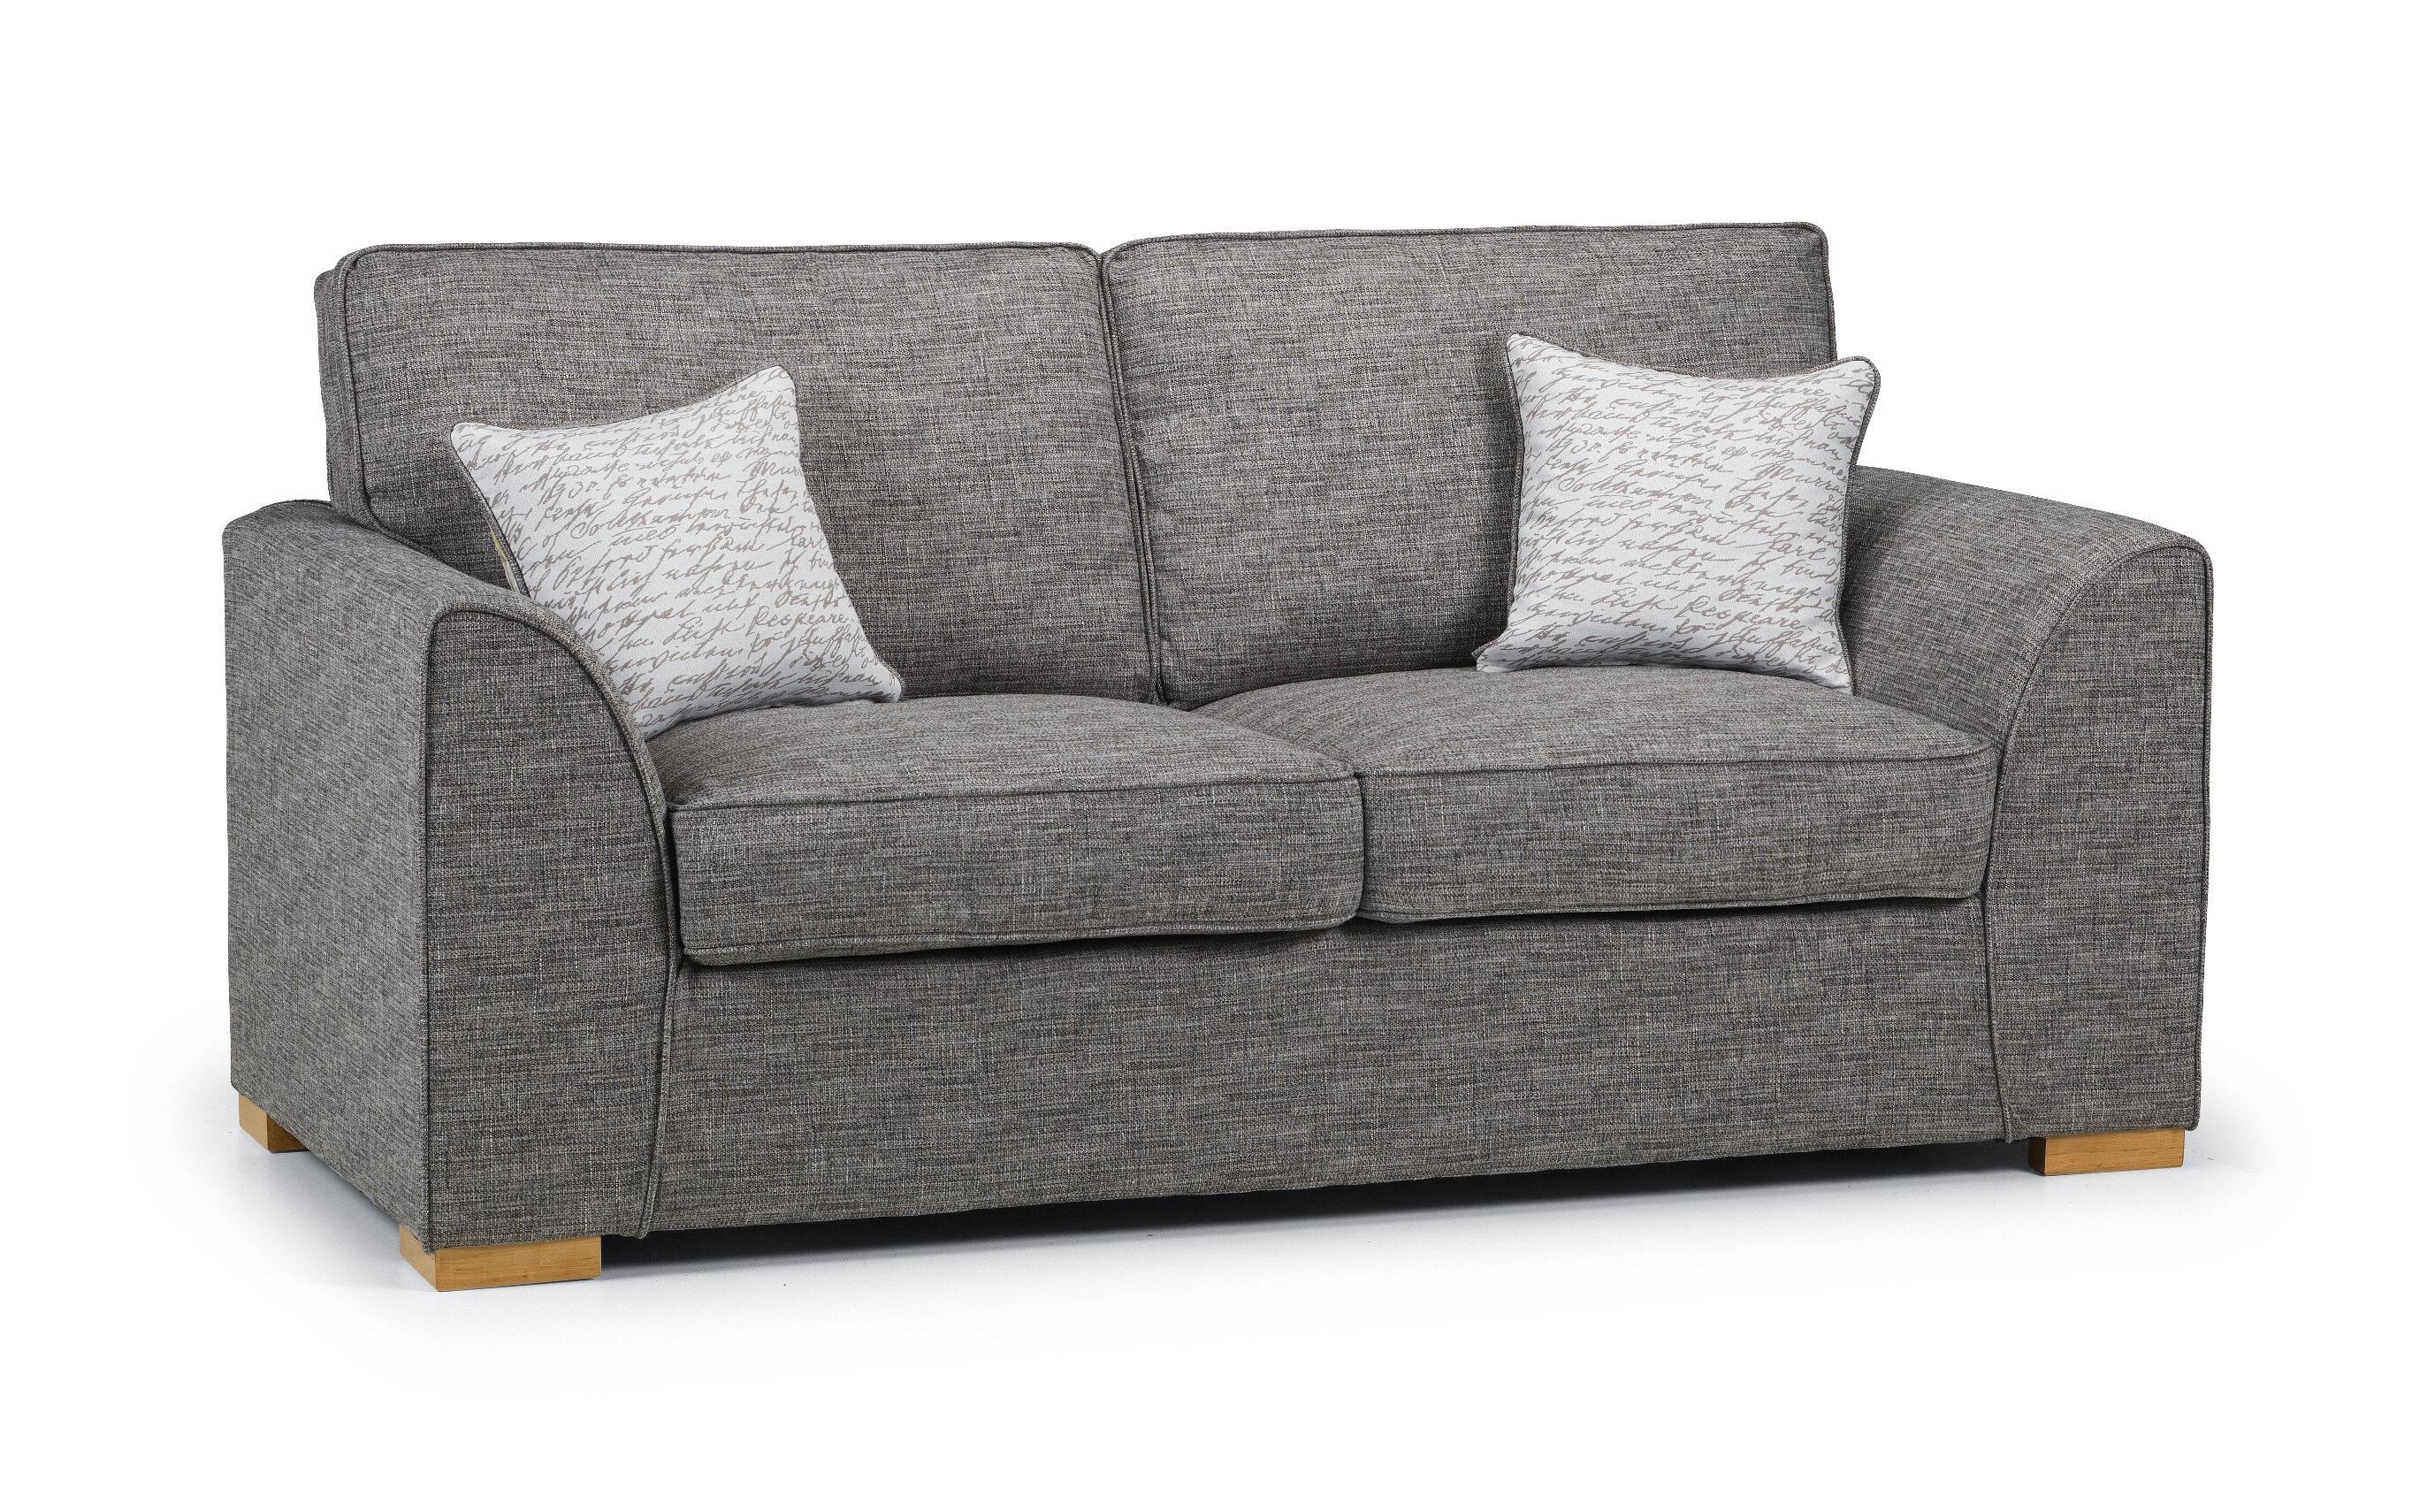 Dallas Sofa Bed Fantastic Furniture Home The Honoroak